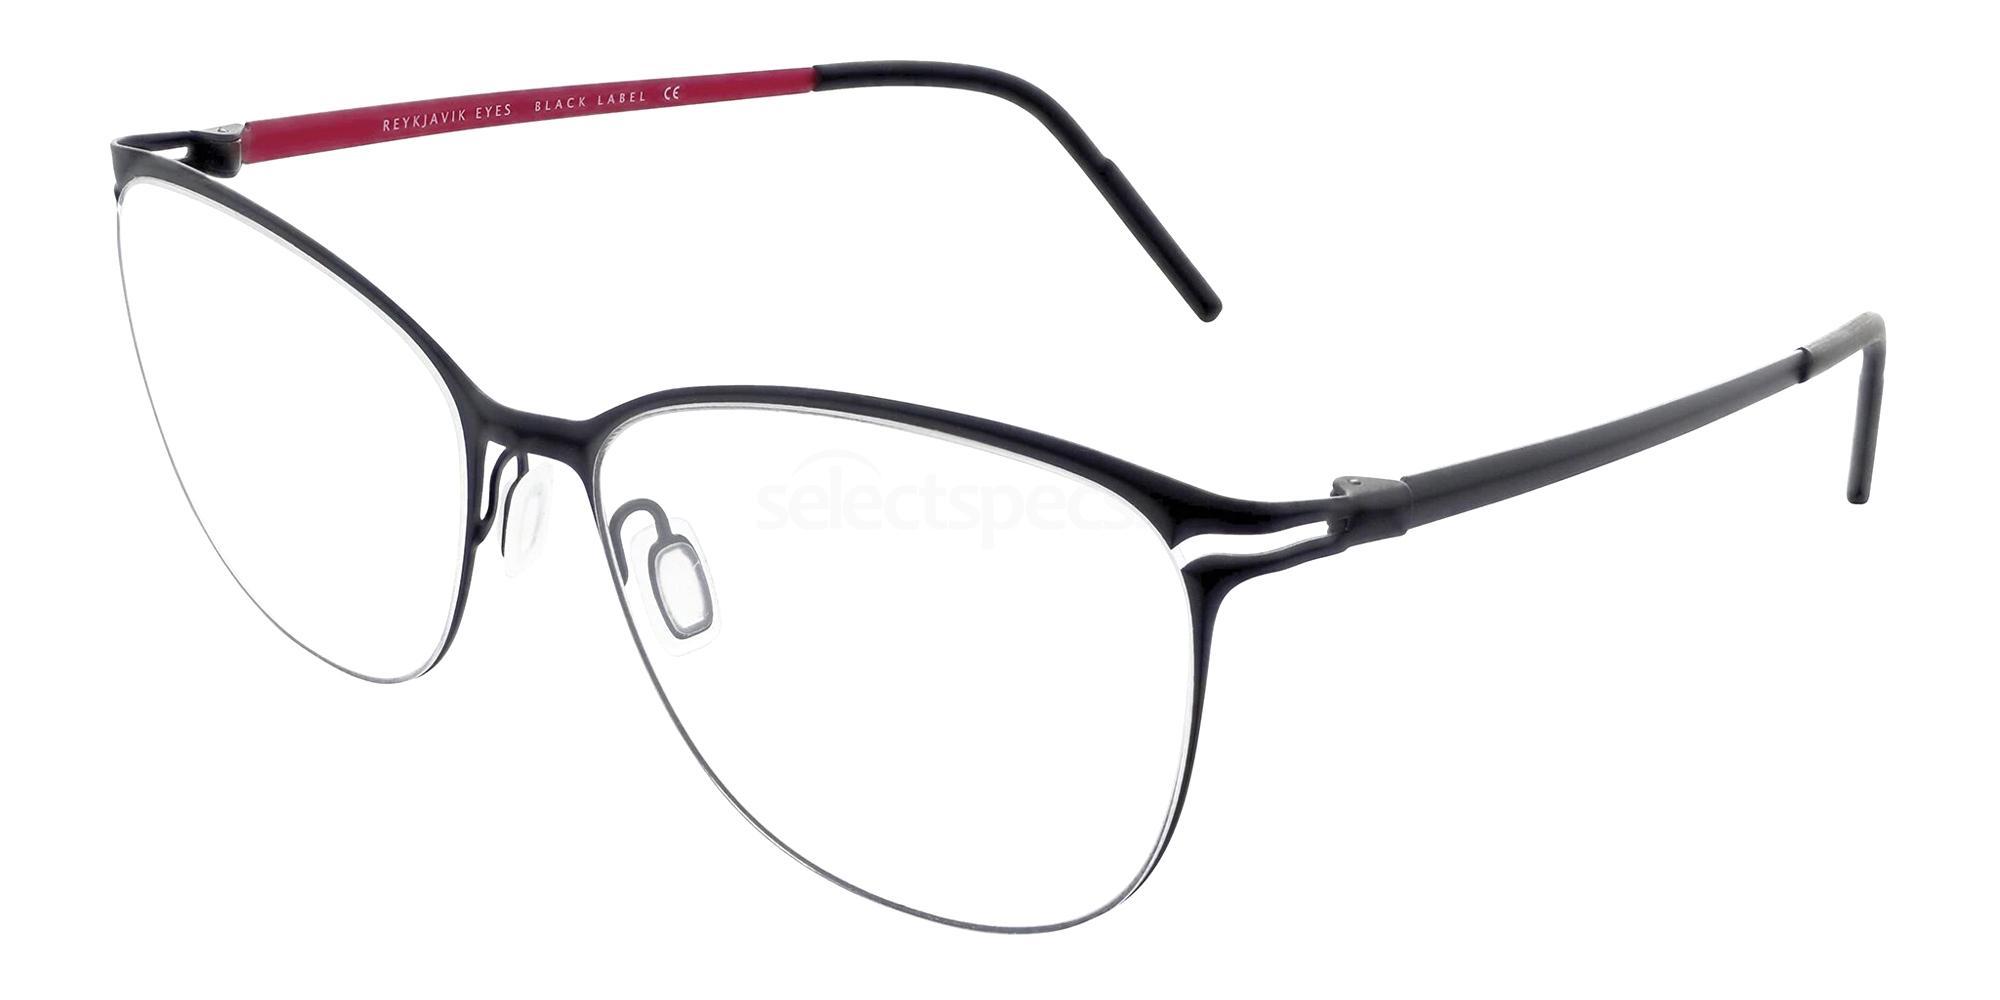 C1 EMBLA Glasses, Reykjavik Eyes Black Label